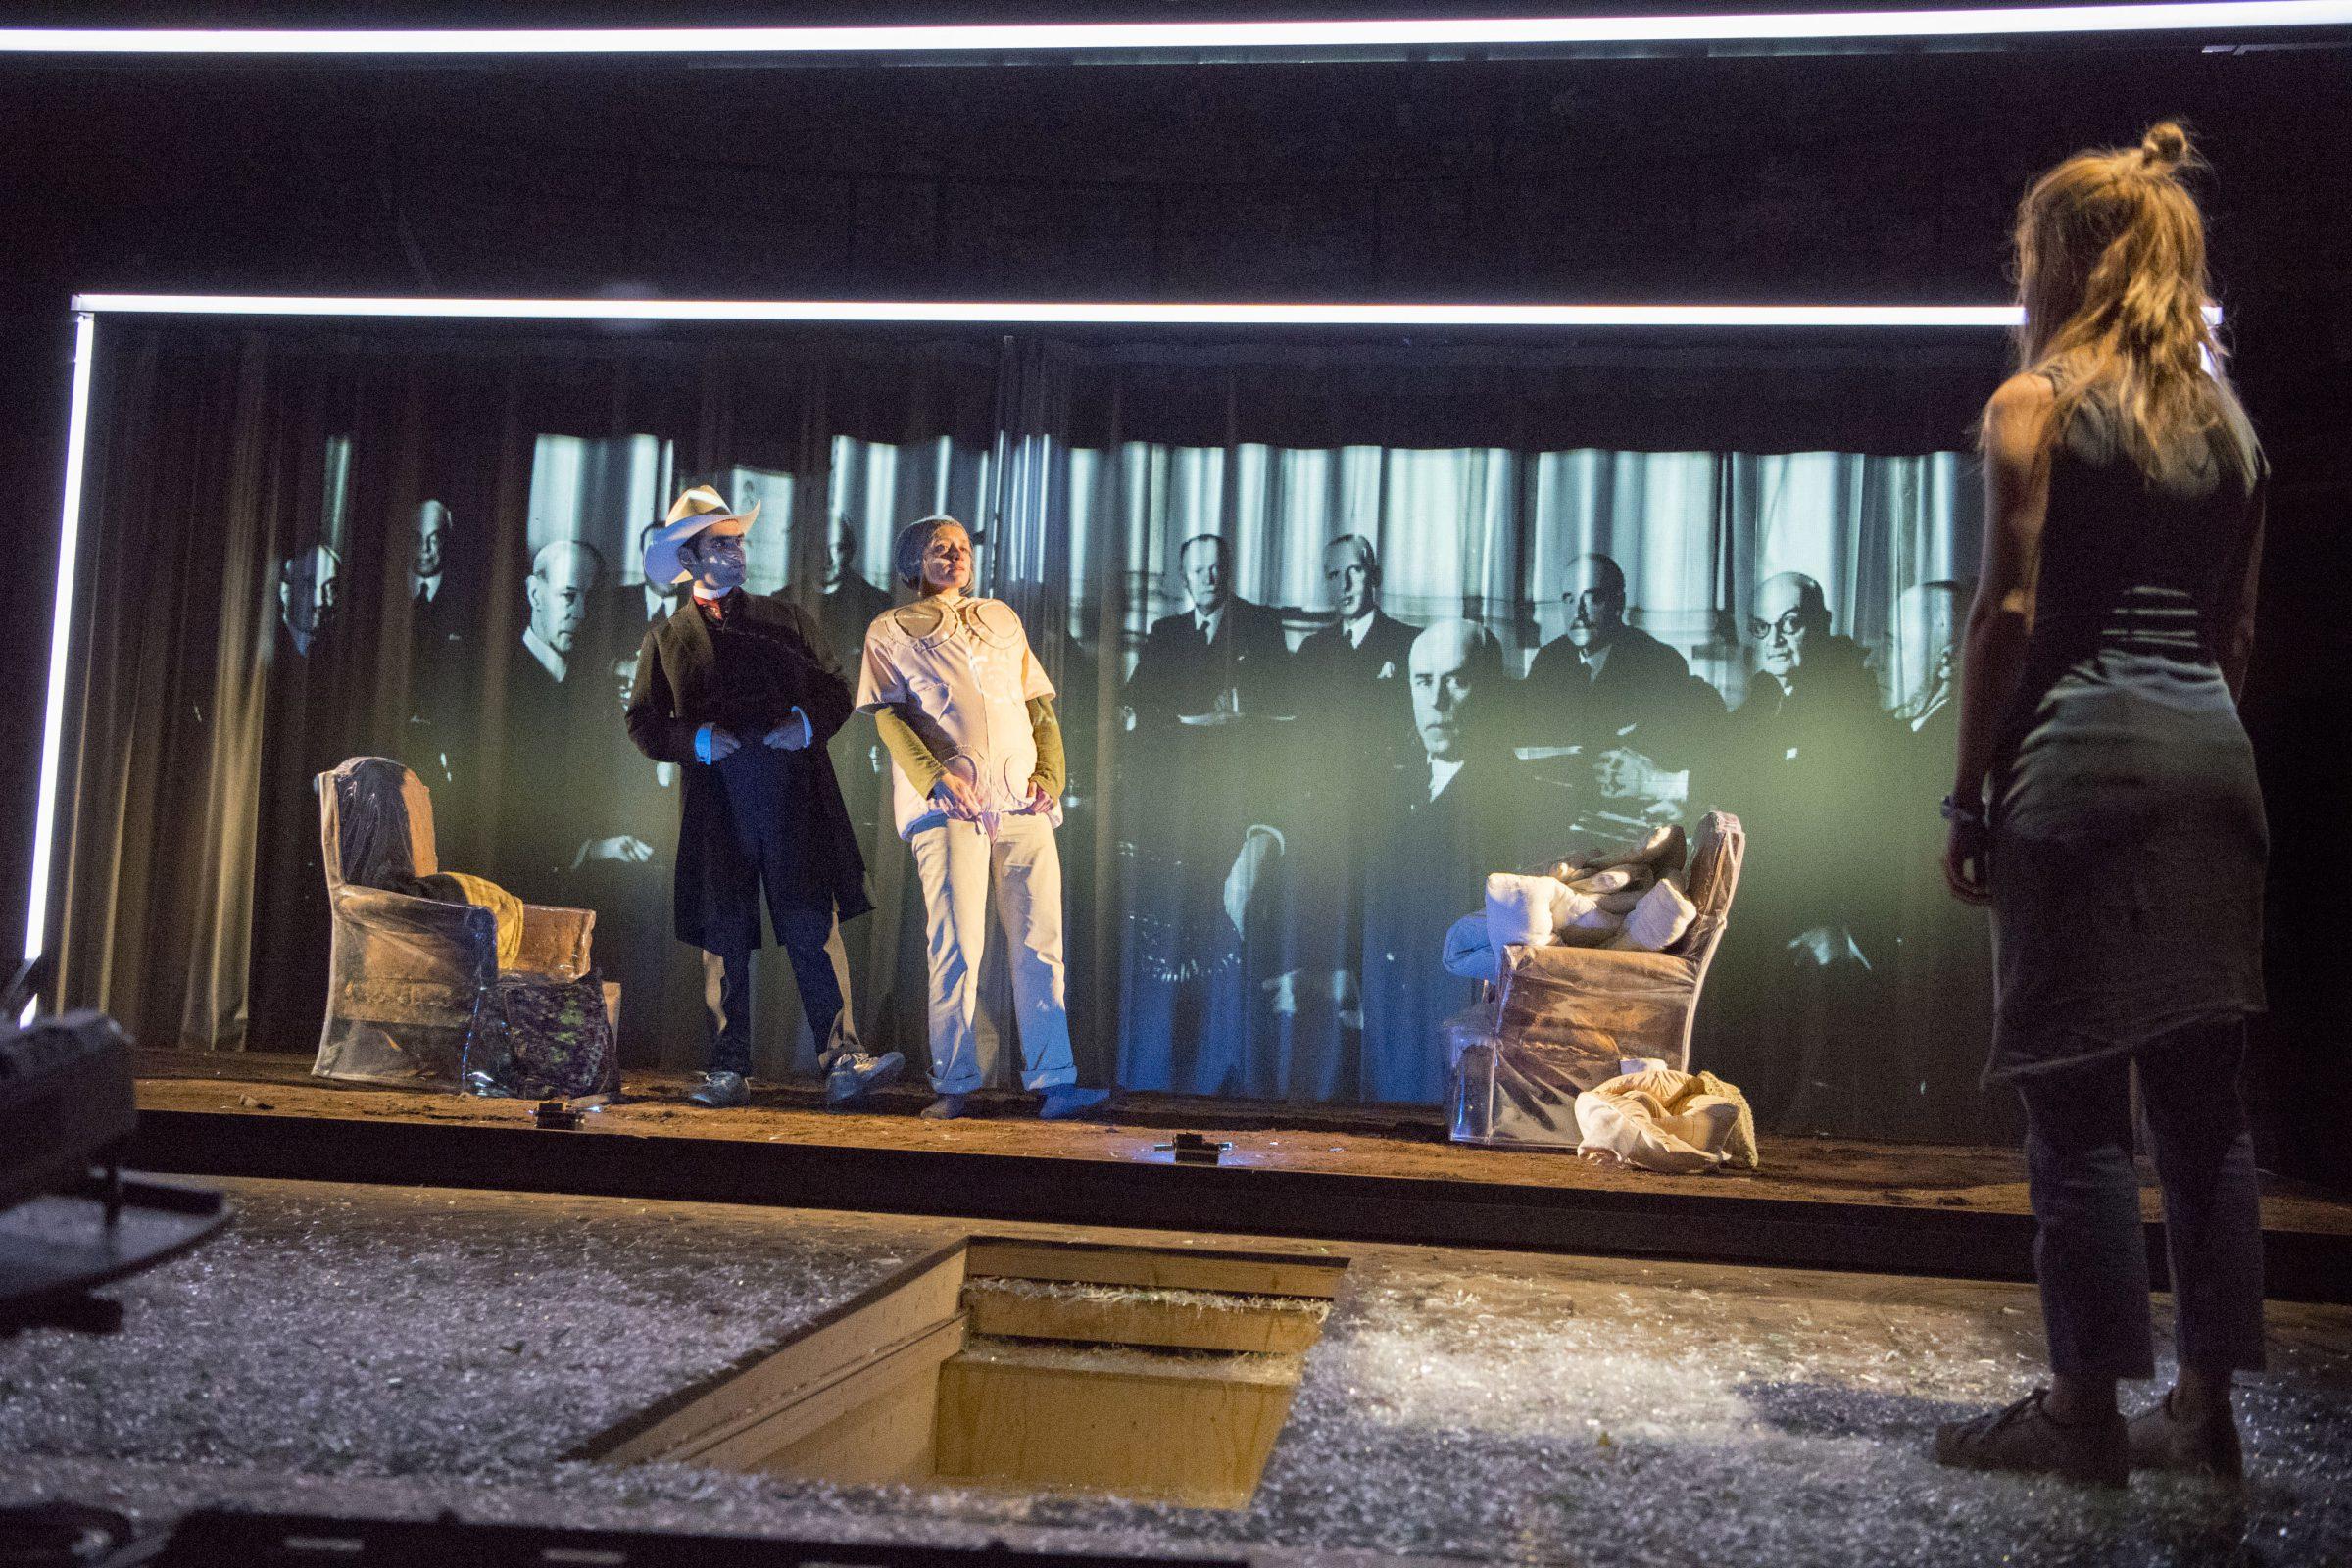 Luke Halls Studio — Oil, Almeida Theatre